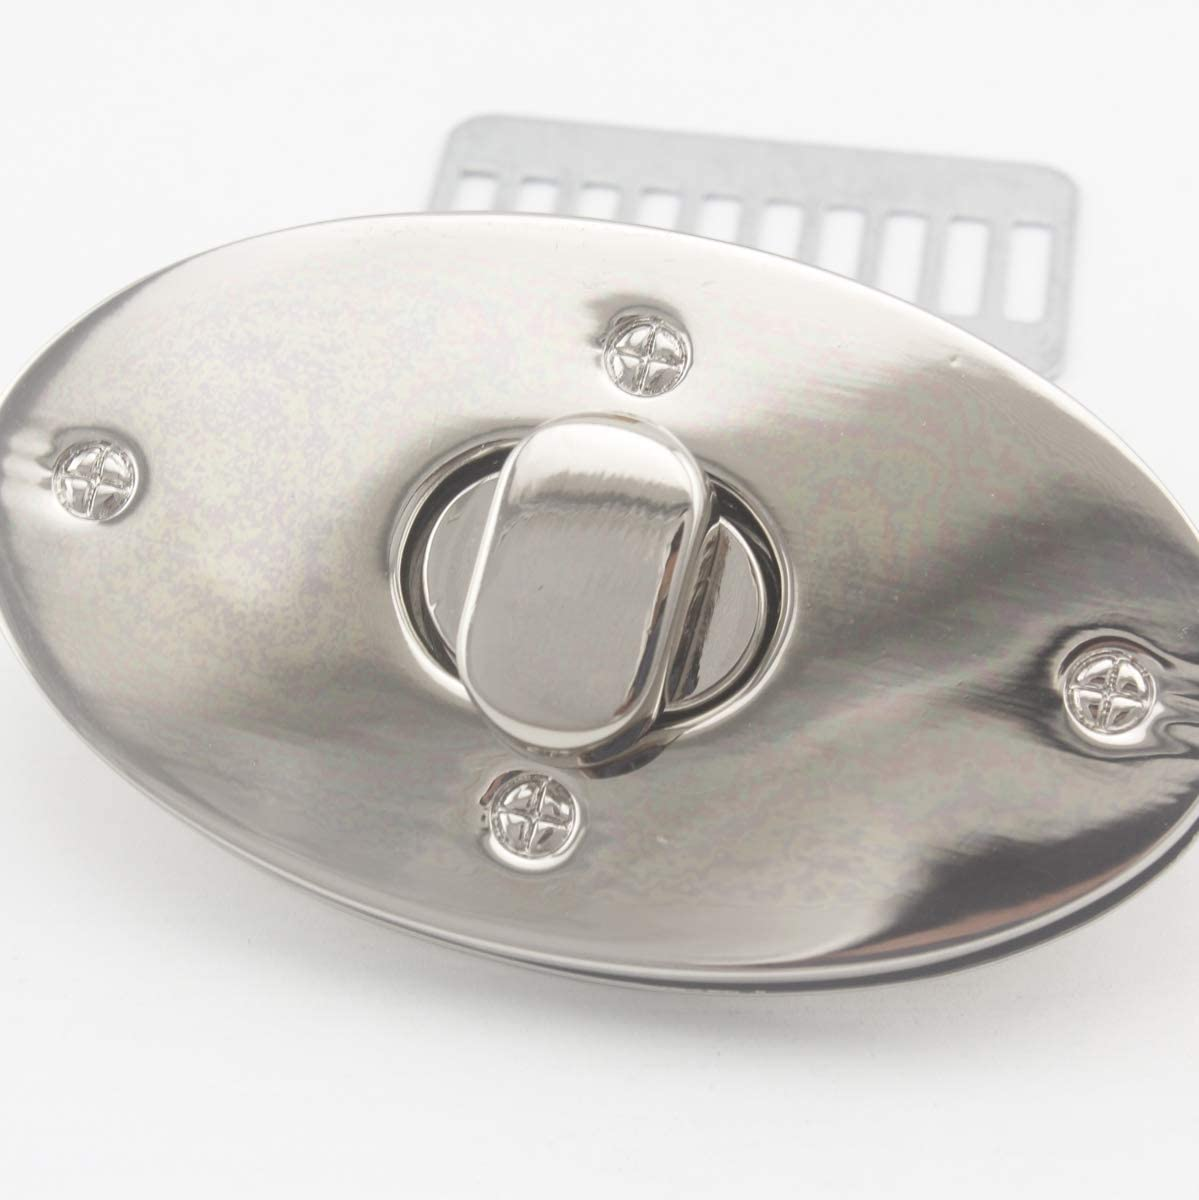 Nickel 6.7cm x 3.9cm Oval Shape Zinc Alloy Twist Lock Turn Lock Purse Lock for Handbag Purse Bag Making 1 Set per lot E65